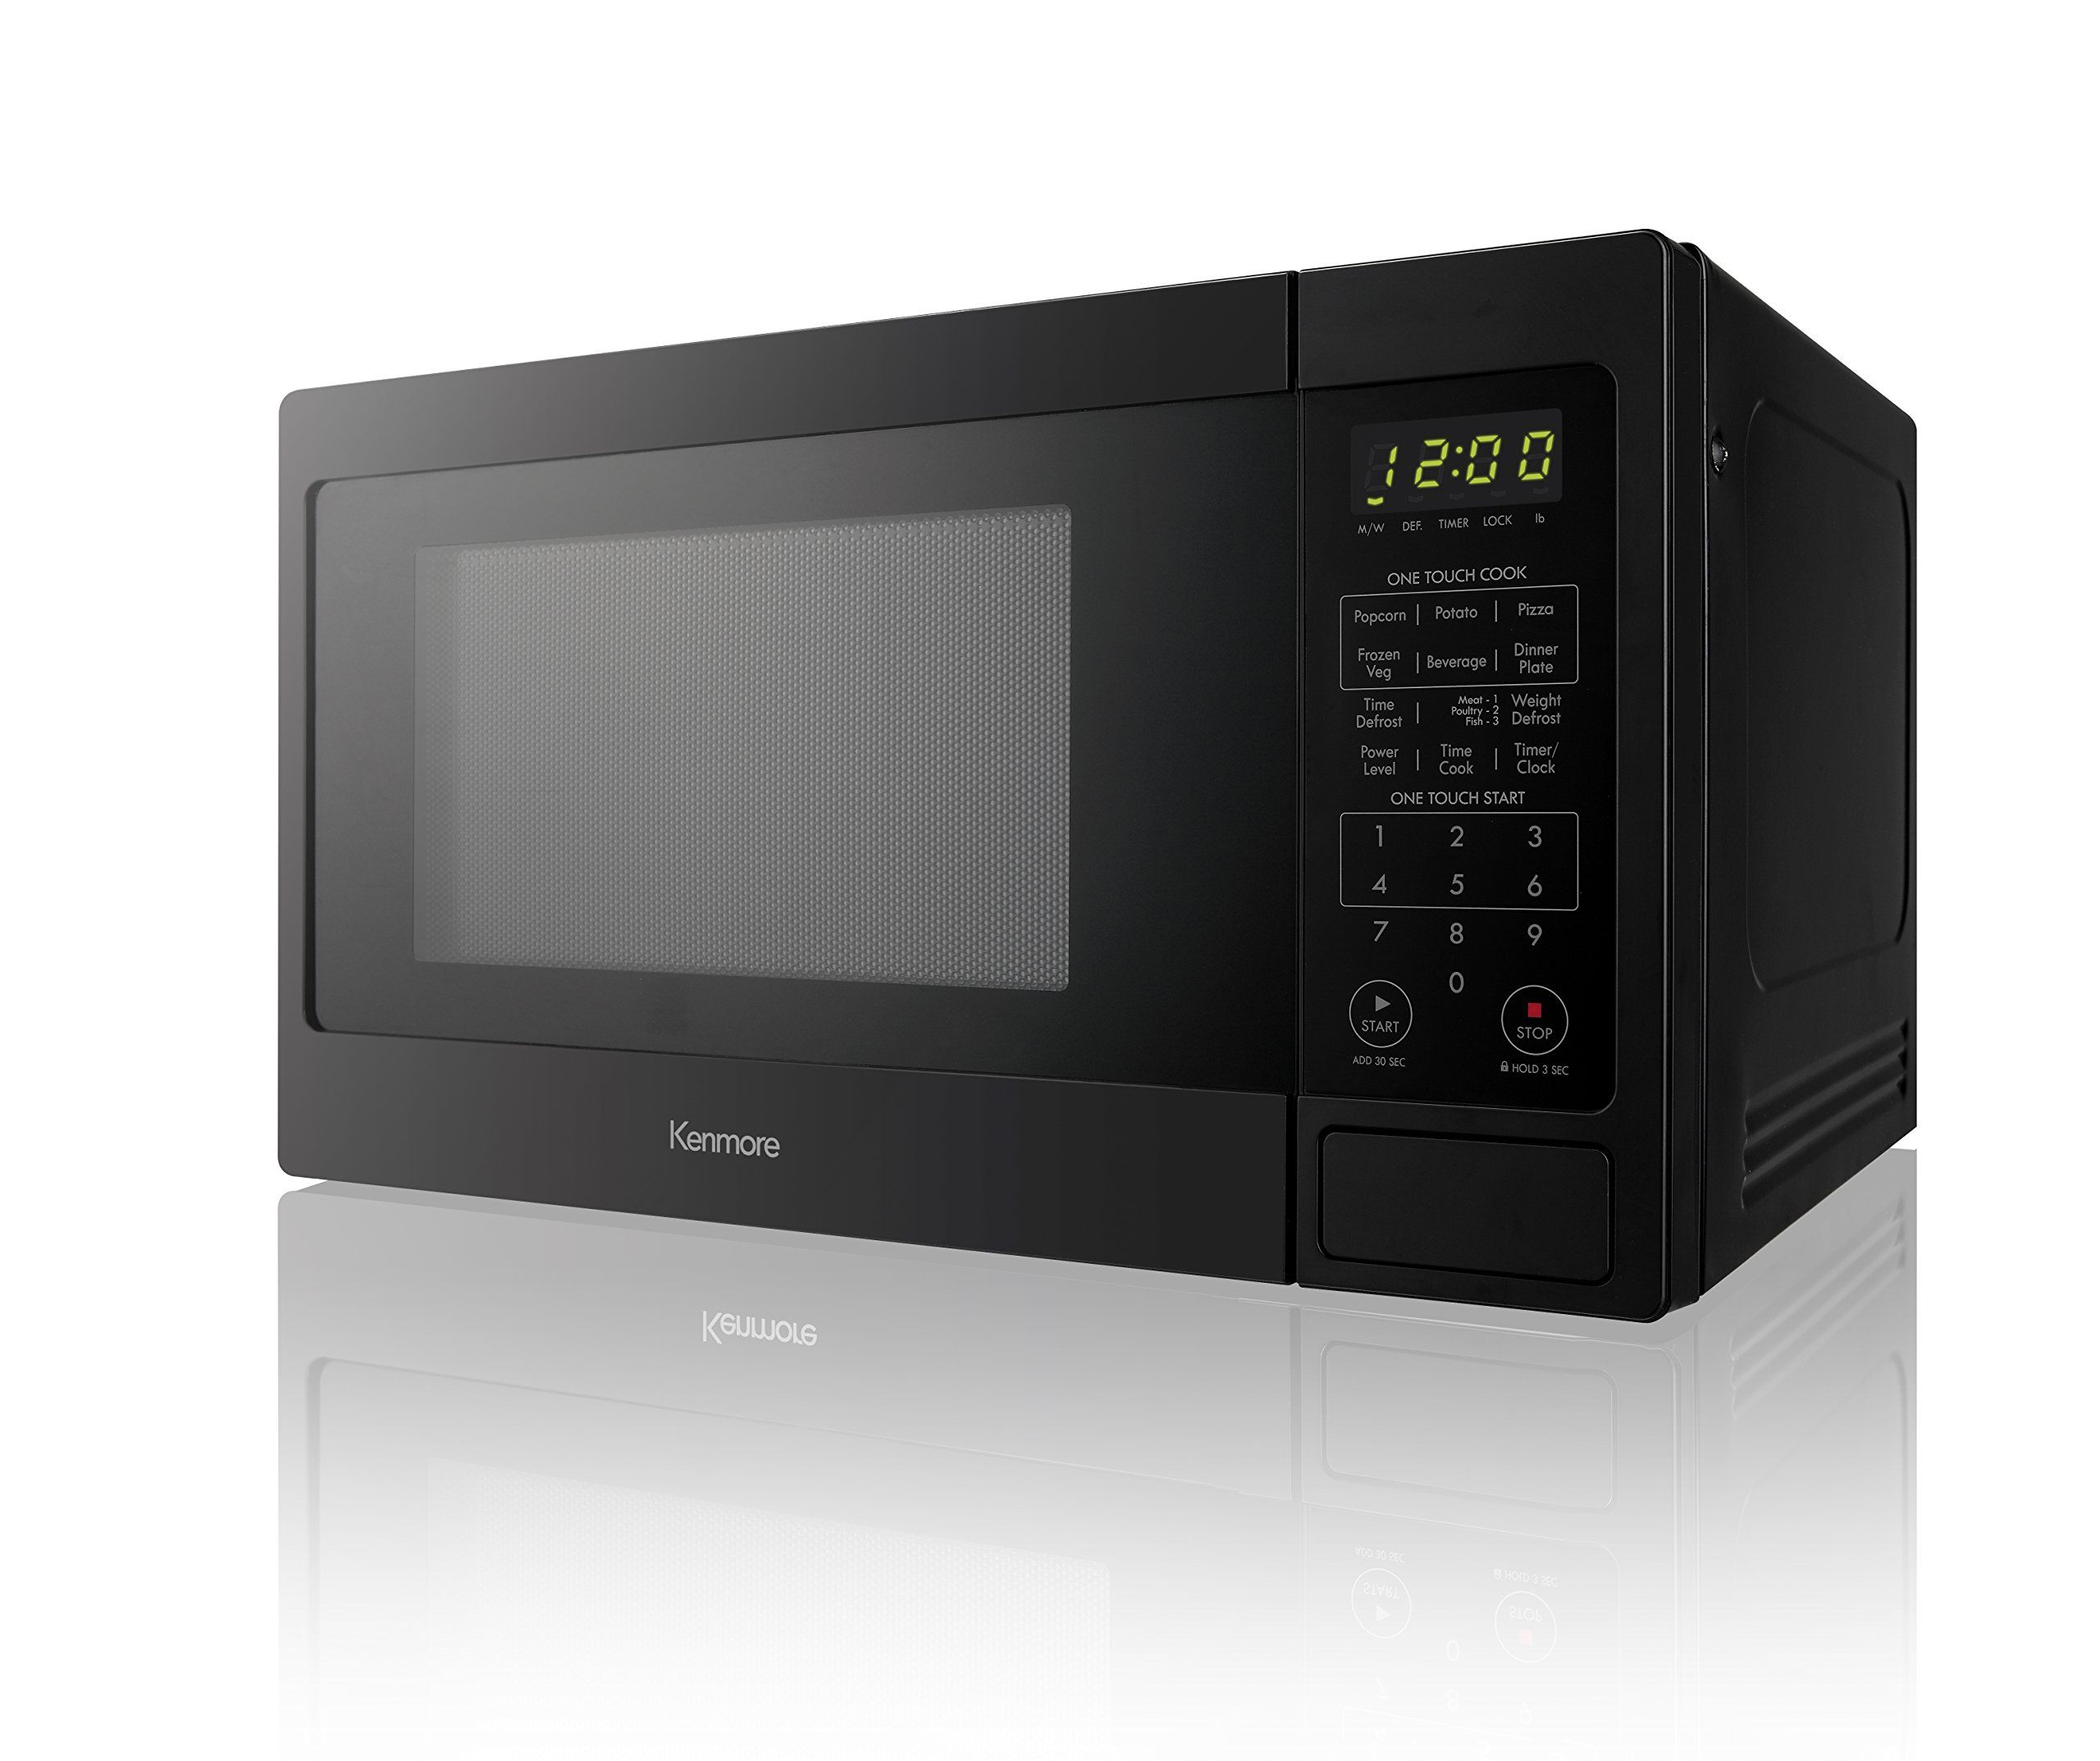 Kenmore 70919 Countertop Microwave 0 9 Cu Ft Black Continue